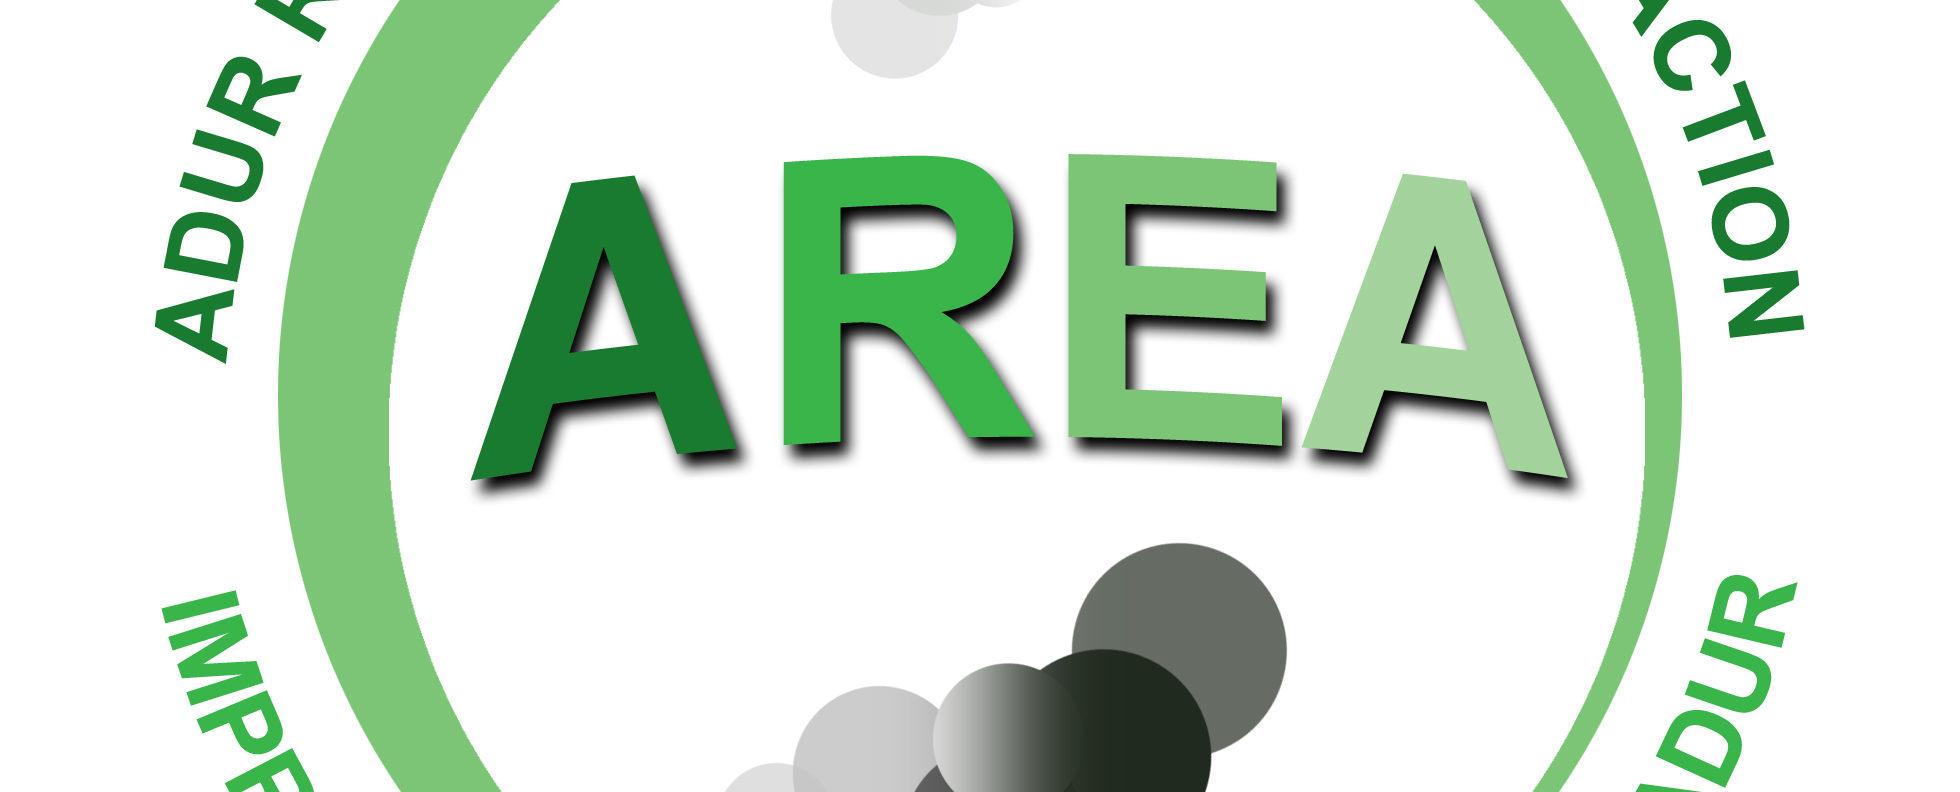 Adur Residents Environmental Action